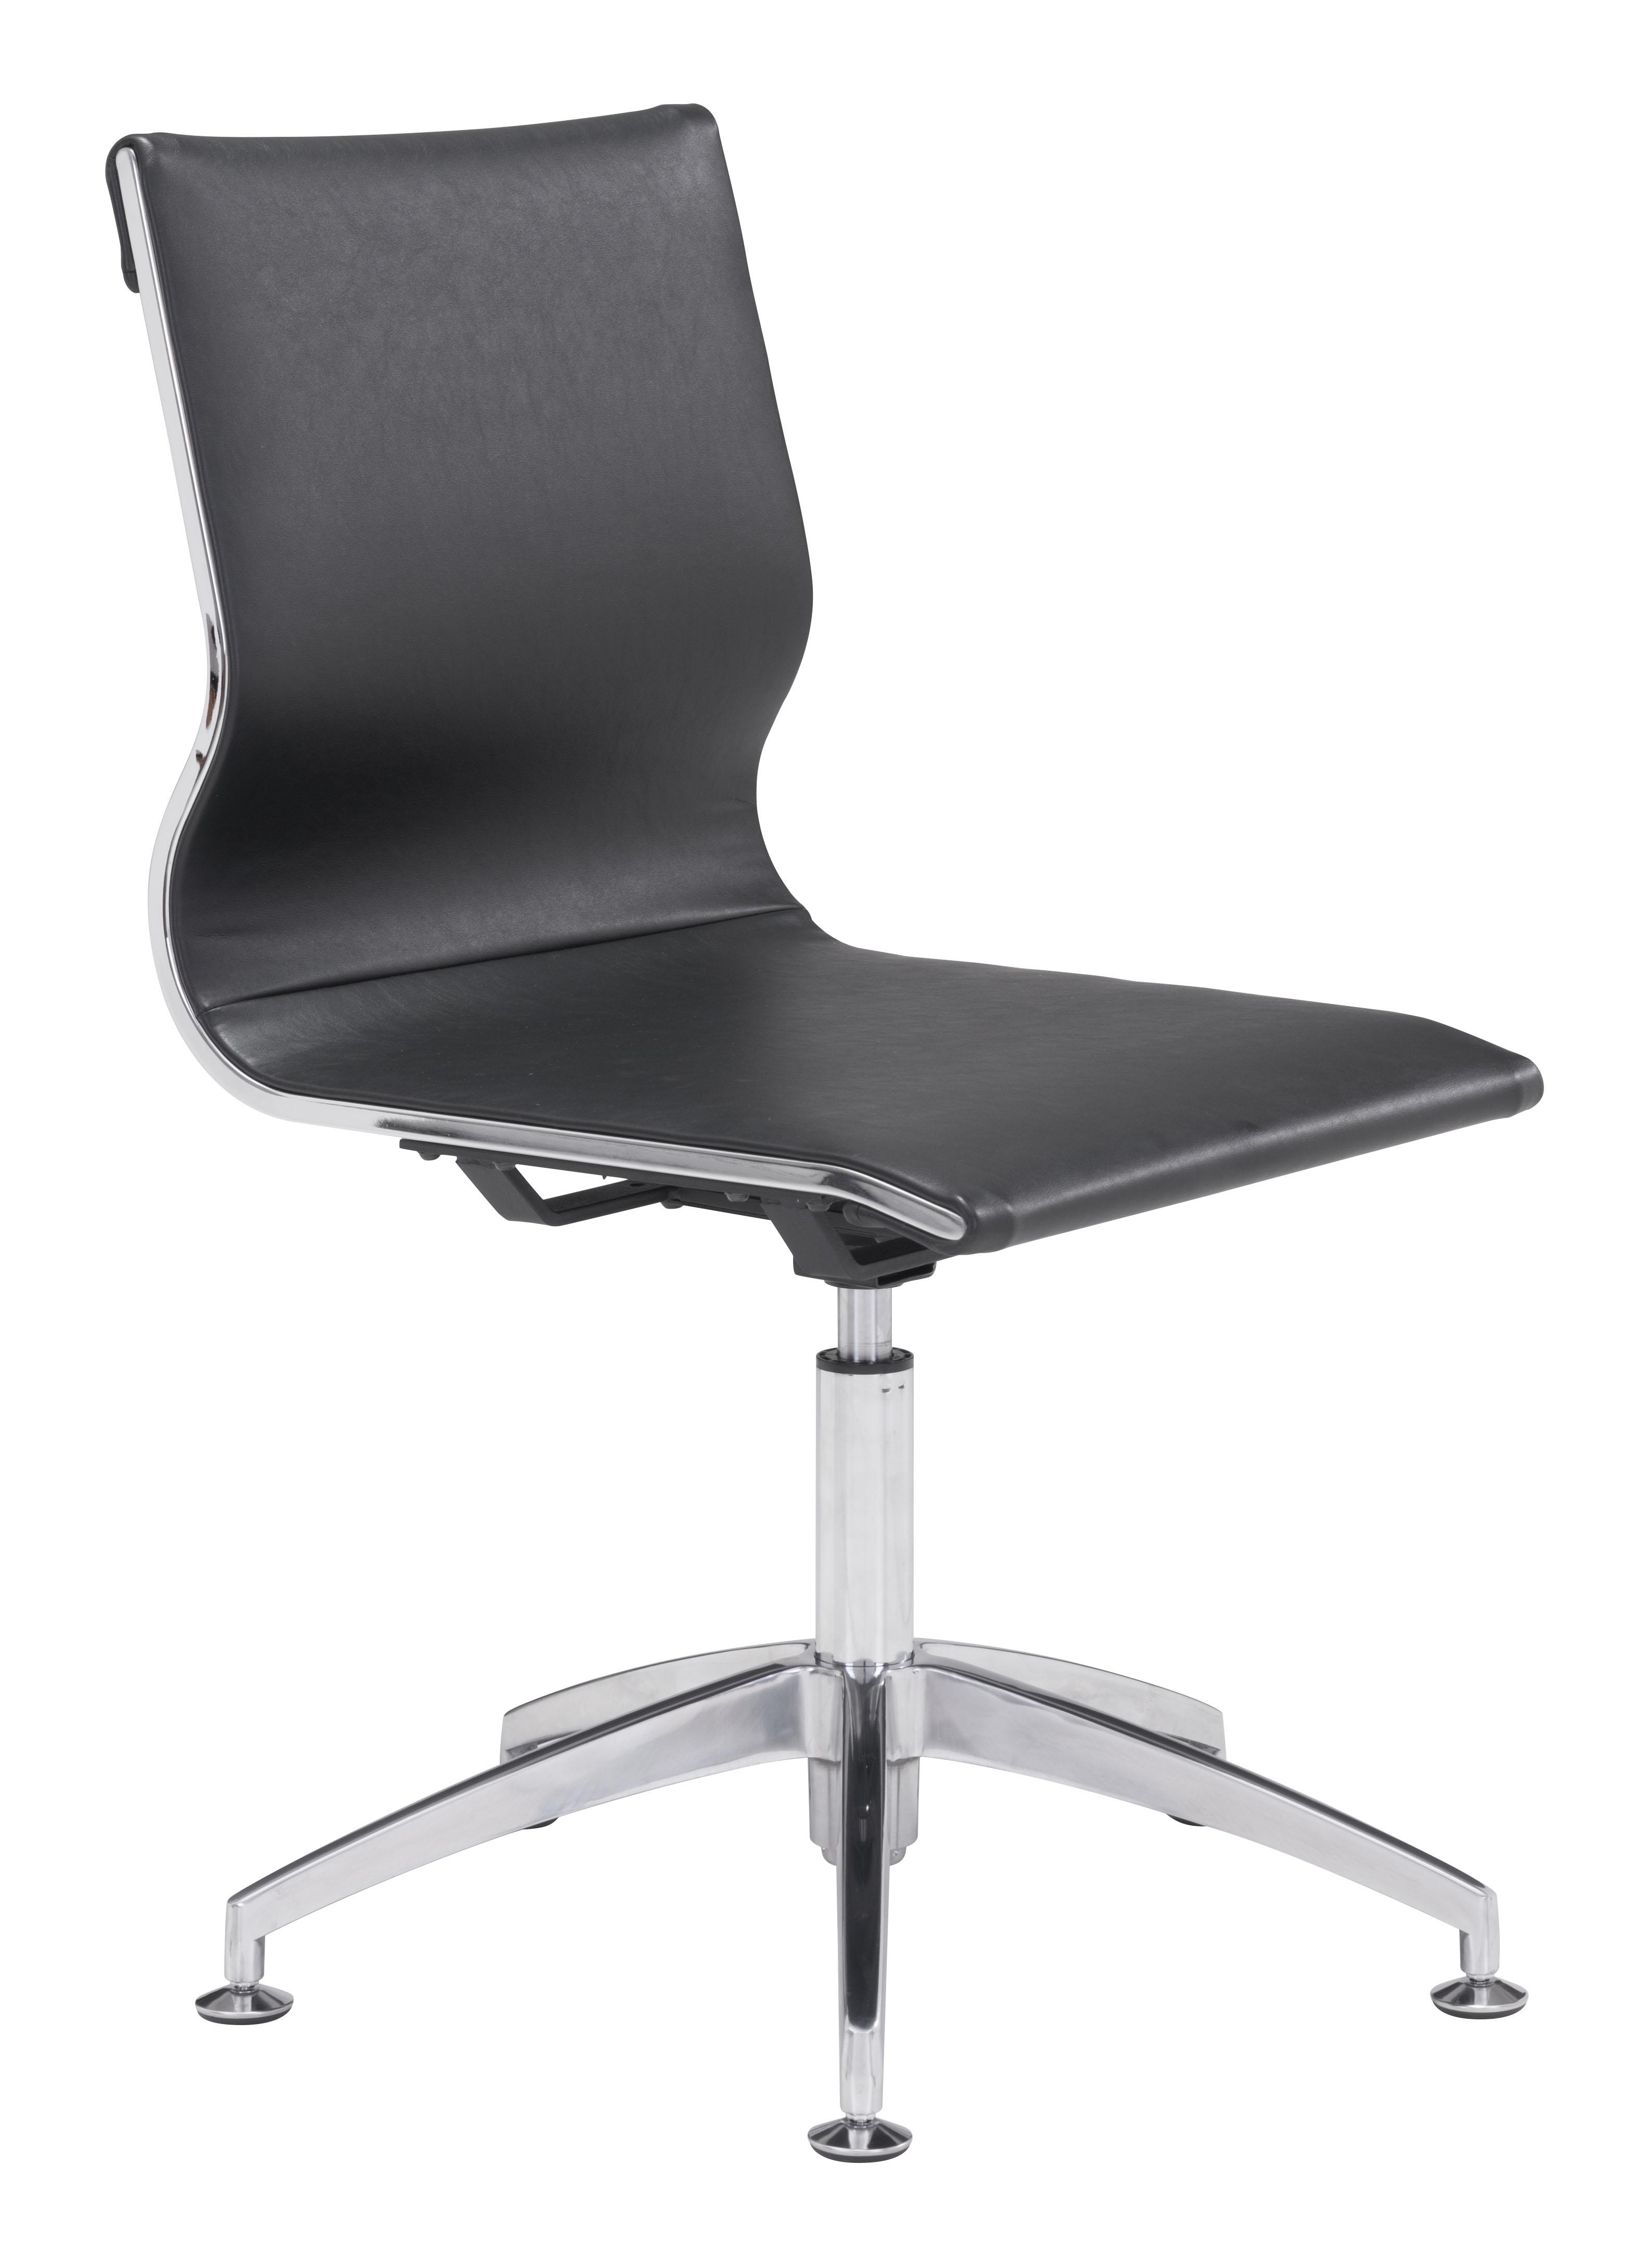 glider-conferece-chair-black-finish.jpg